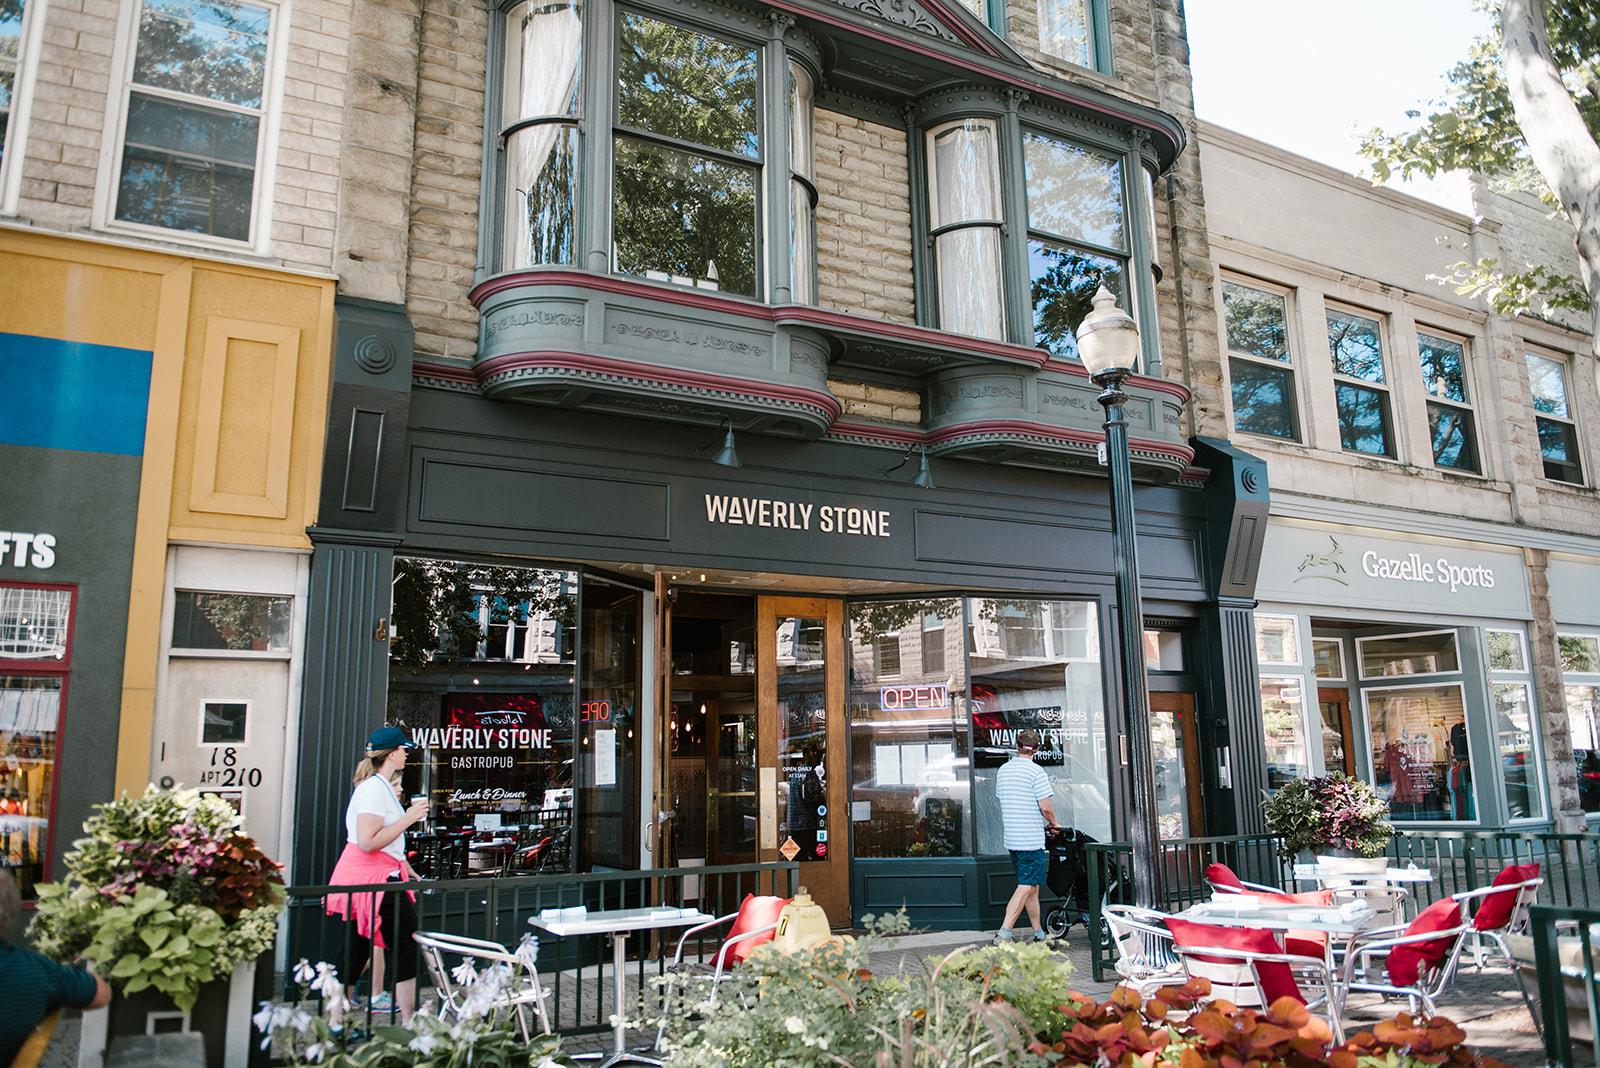 patio-outdoor-restaurant-waverly-stone